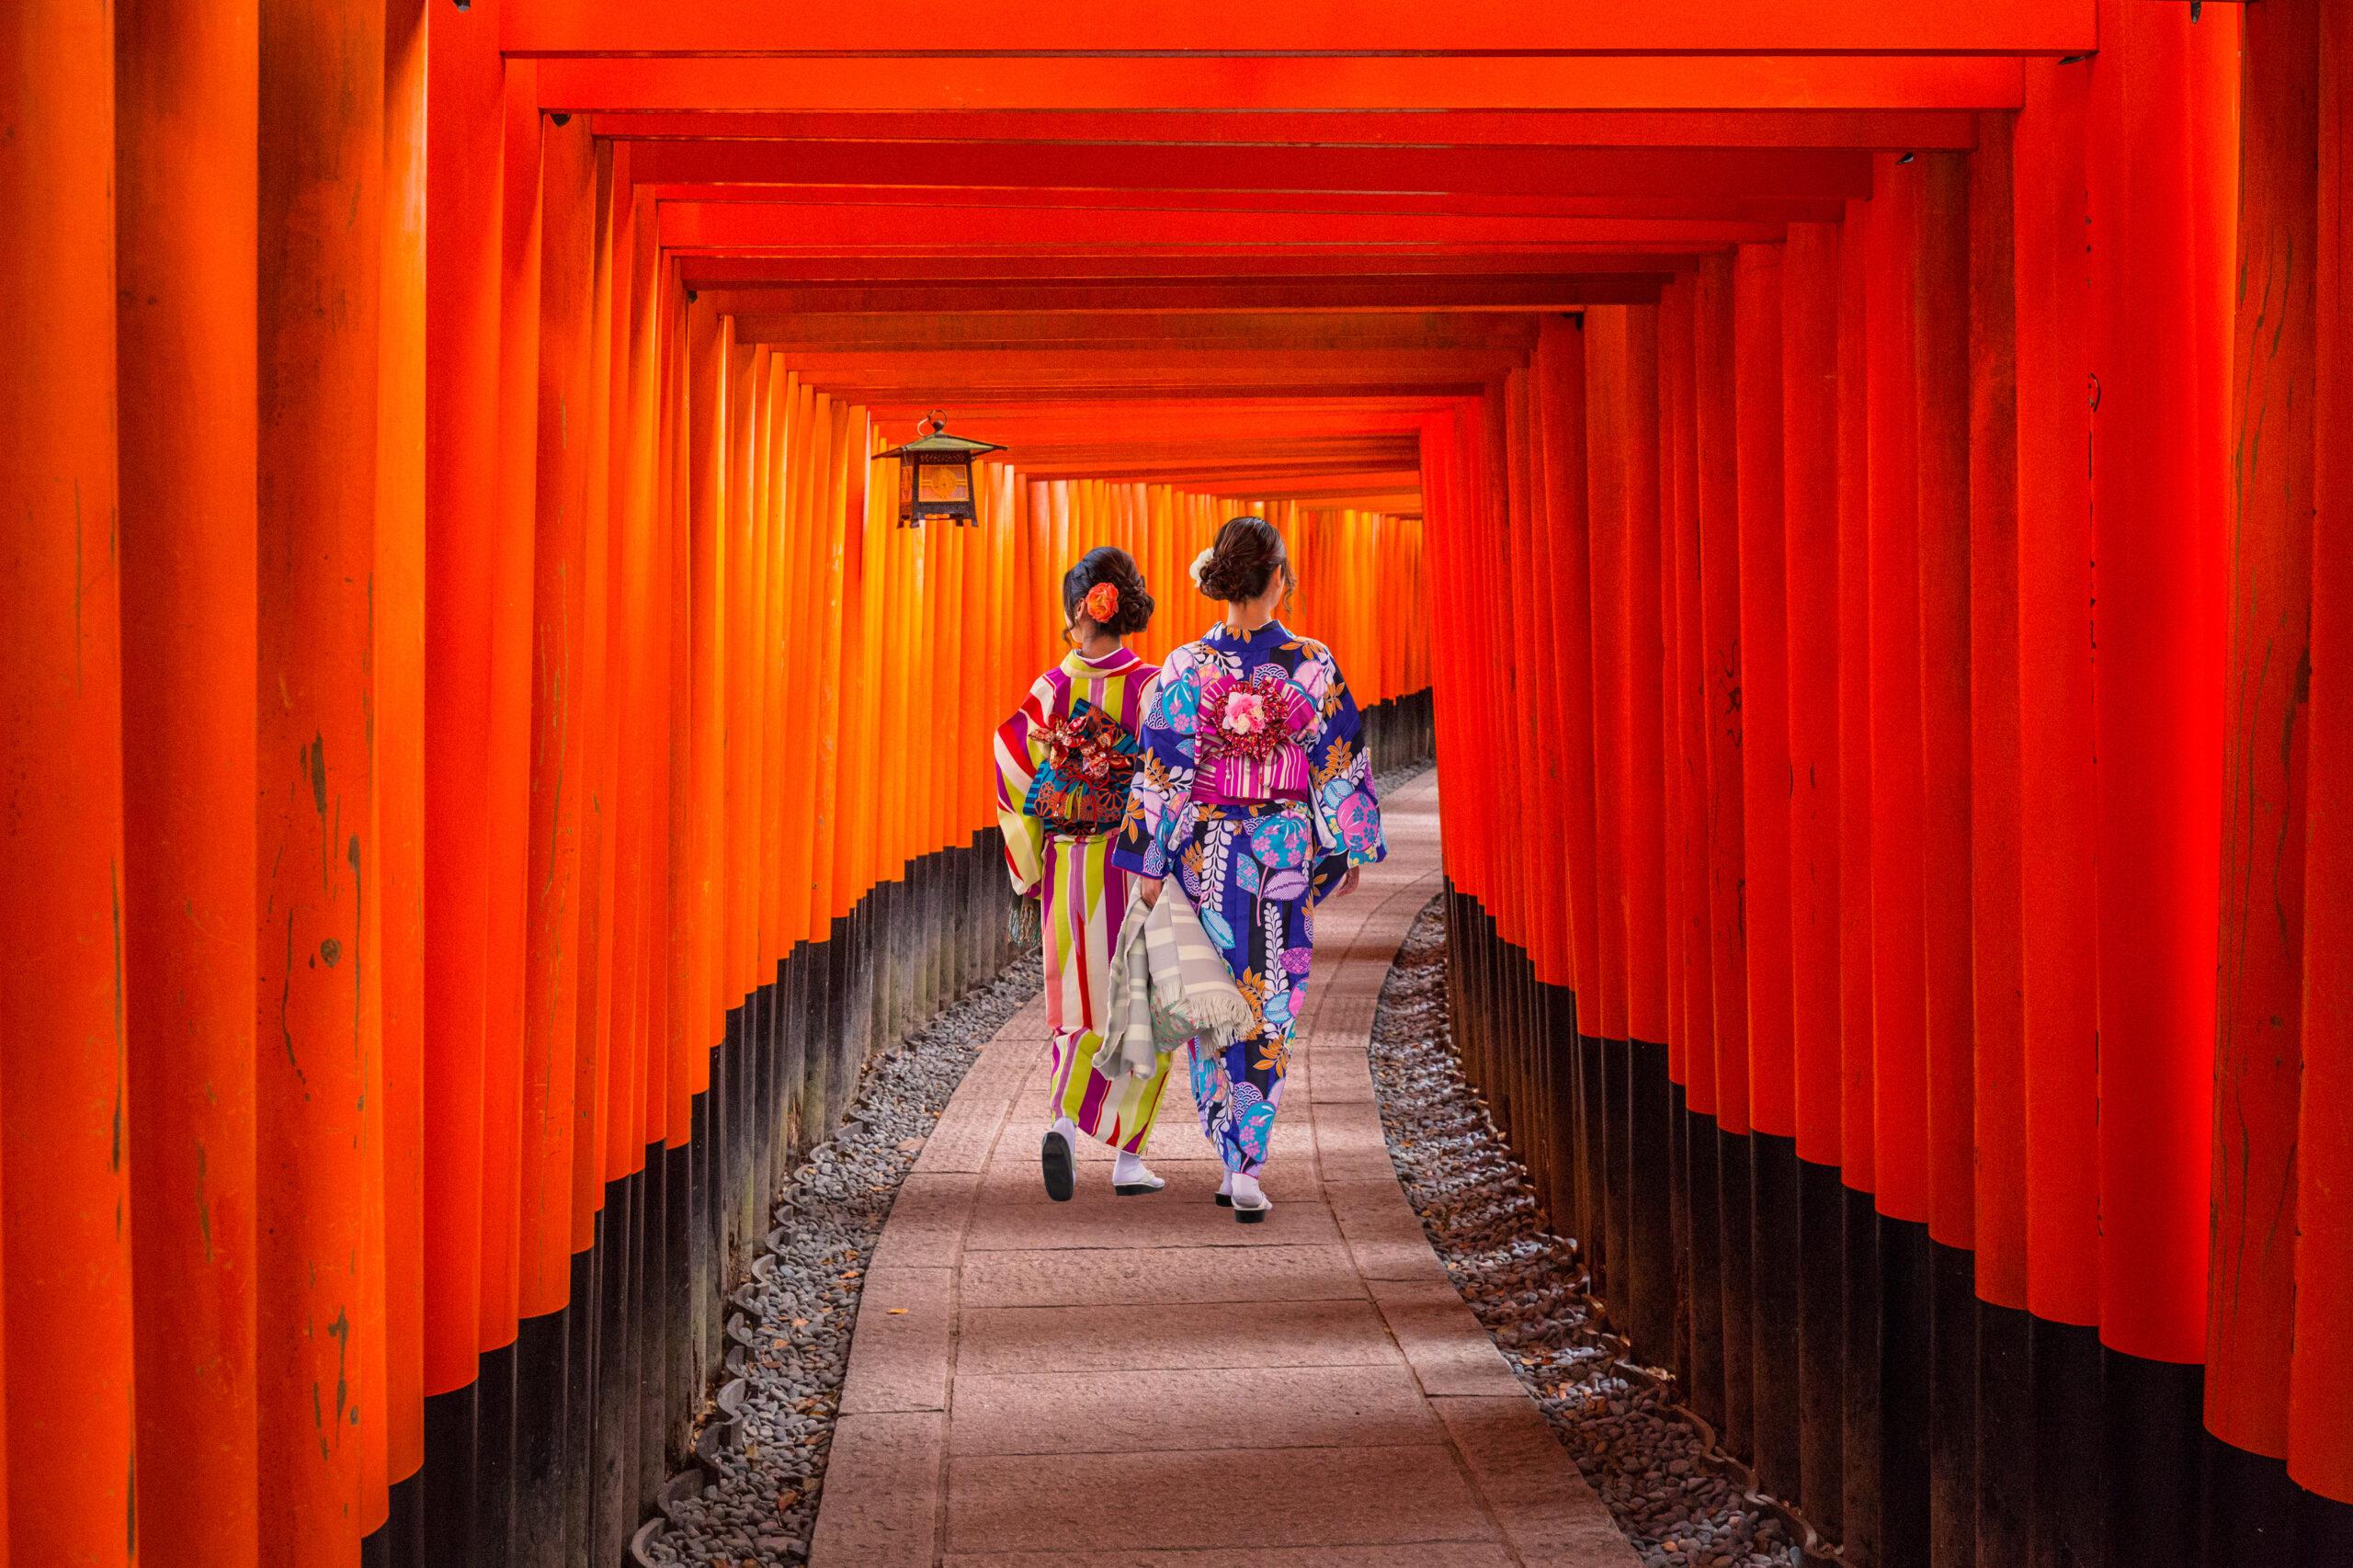 Women in traditional japanese kimonos walking at Fushimi Inari Shrine in Kyoto, Japan.